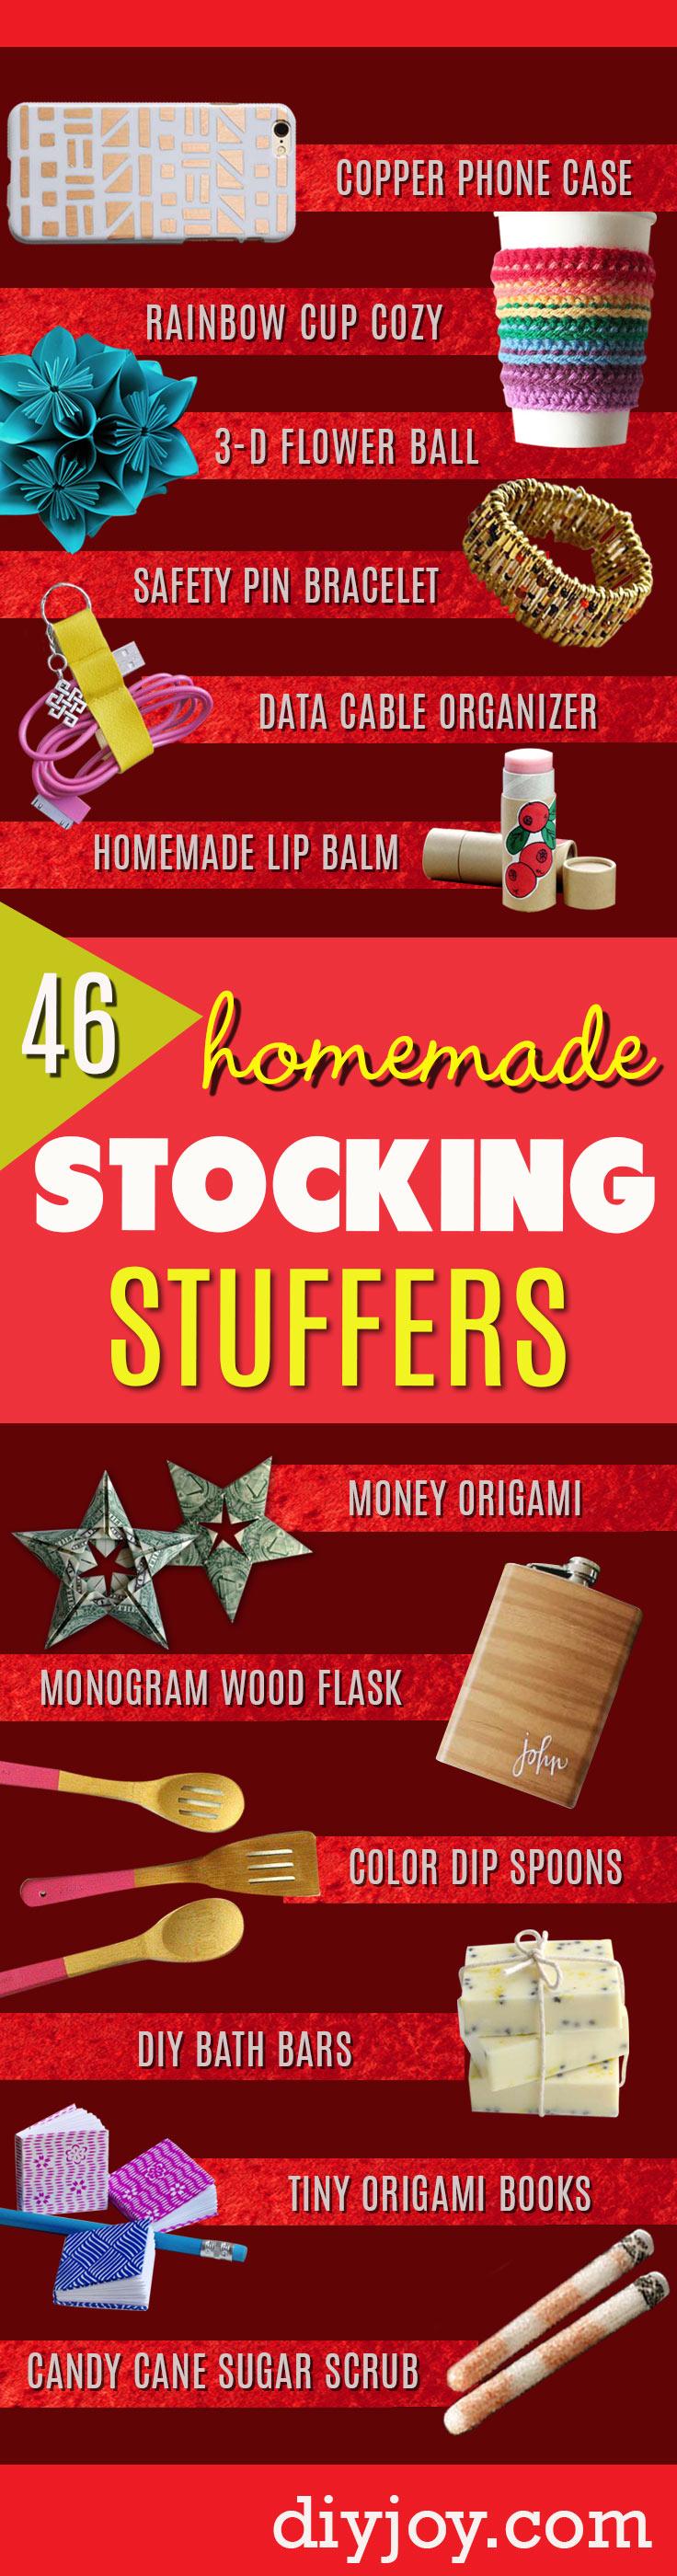 DIY Stocking Stuffers - Fun Stocking Ideas - Tiny Gifts for Friends | Cute DIY Christmas Stocking Stuffer Gifts- Small Christmas Crafts #christmasgifts #diy